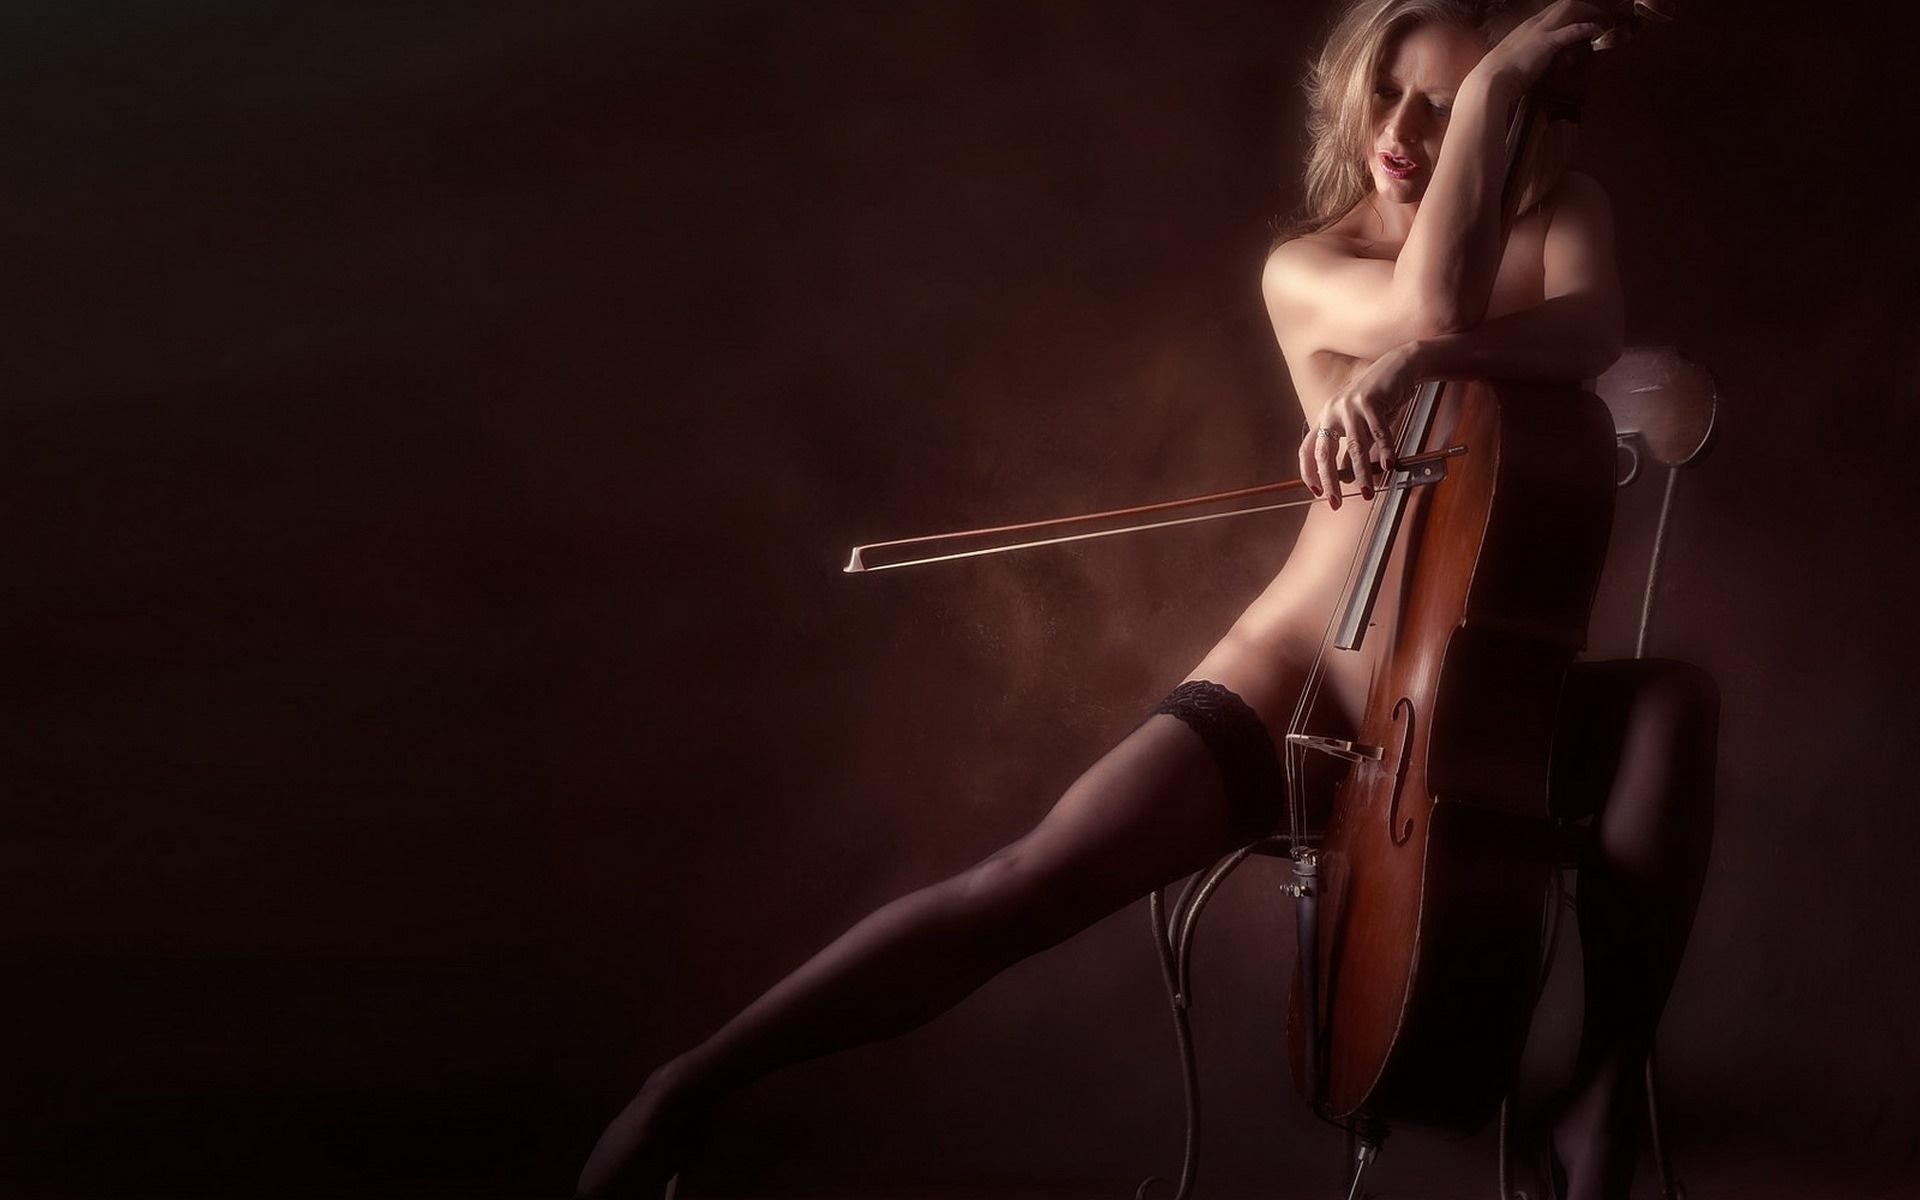 visokokachestvennaya-erotika-s-muzikoy-seks-paren-s-devushkoy-strast-foto